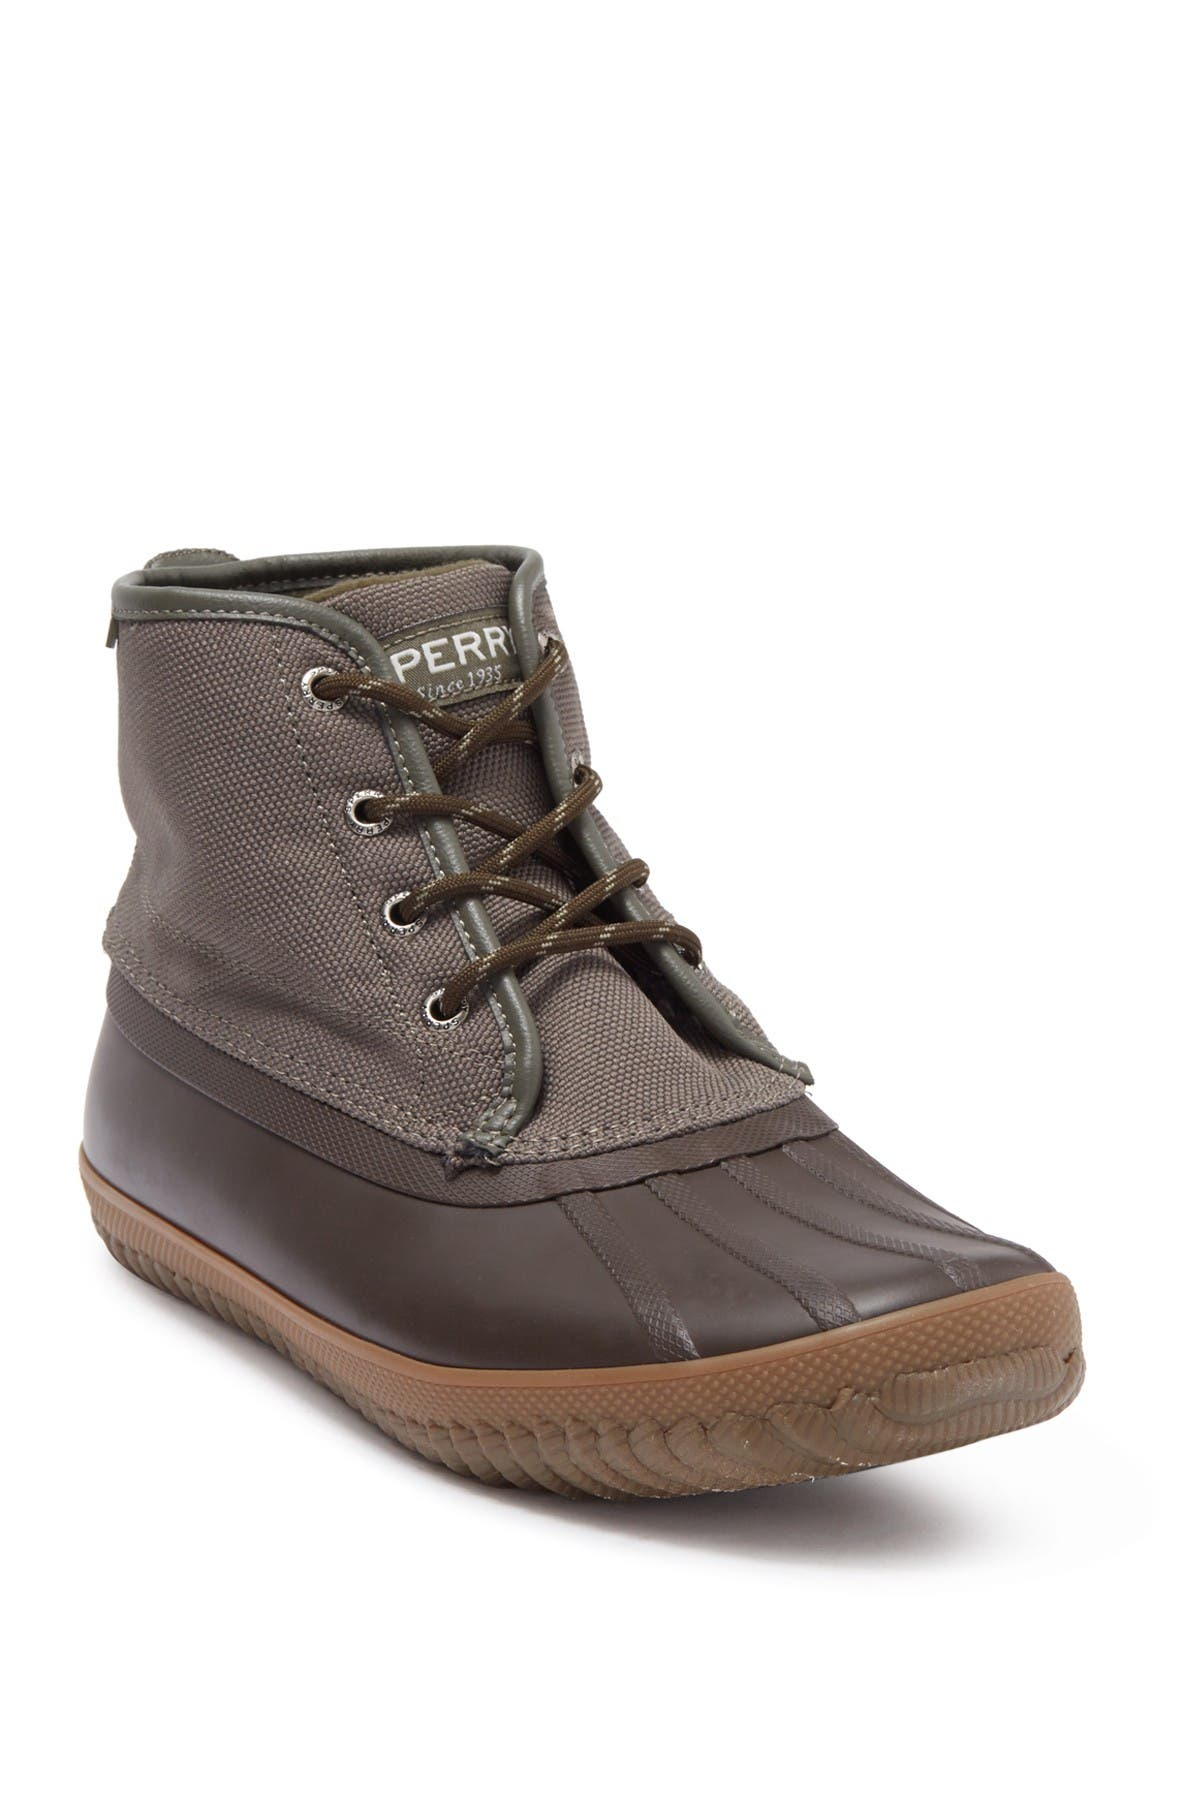 Sperry Shoes for Men | Nordstrom Rack